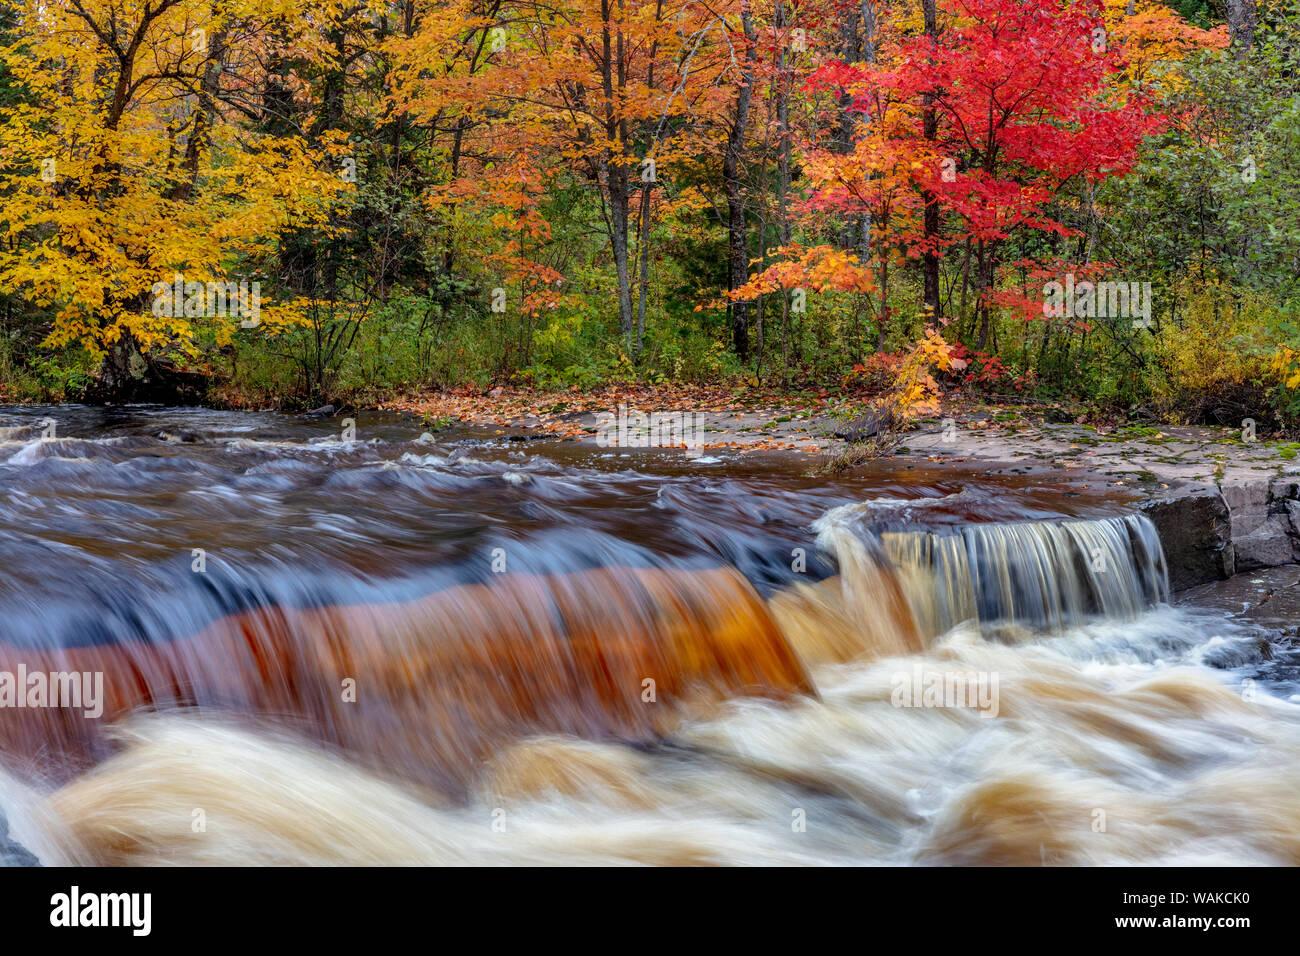 Sturgeon River in autumn near Alberta in the Upper Peninsula of Michigan, USA Stock Photo